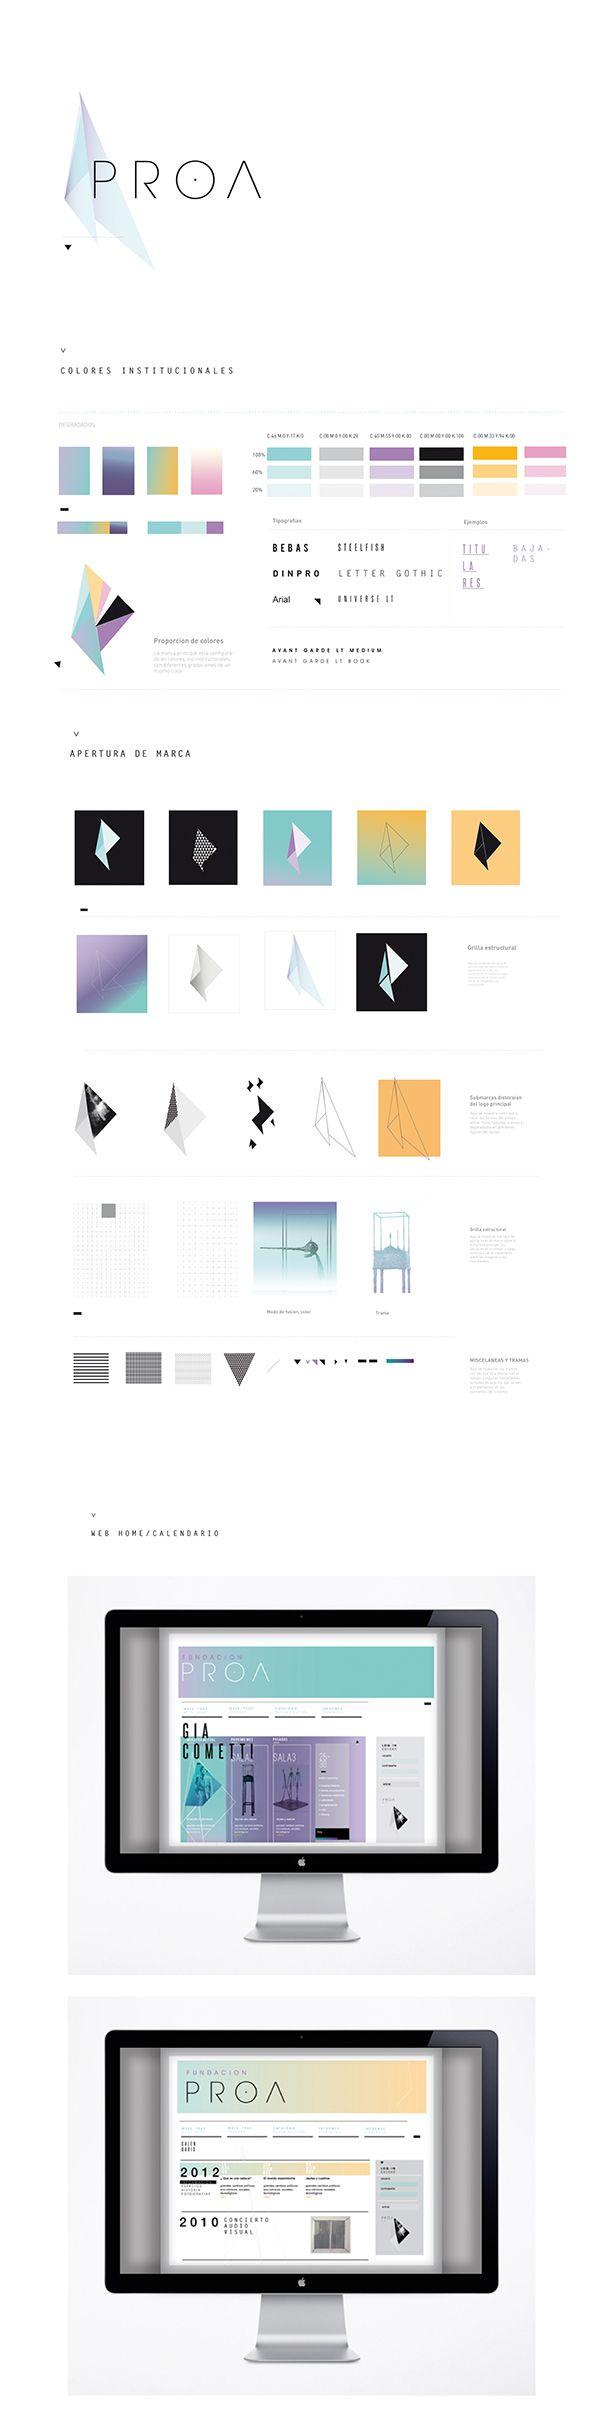 Diseño Gráfico 2 Cátedra Gabriele - FADU - UBA -2012